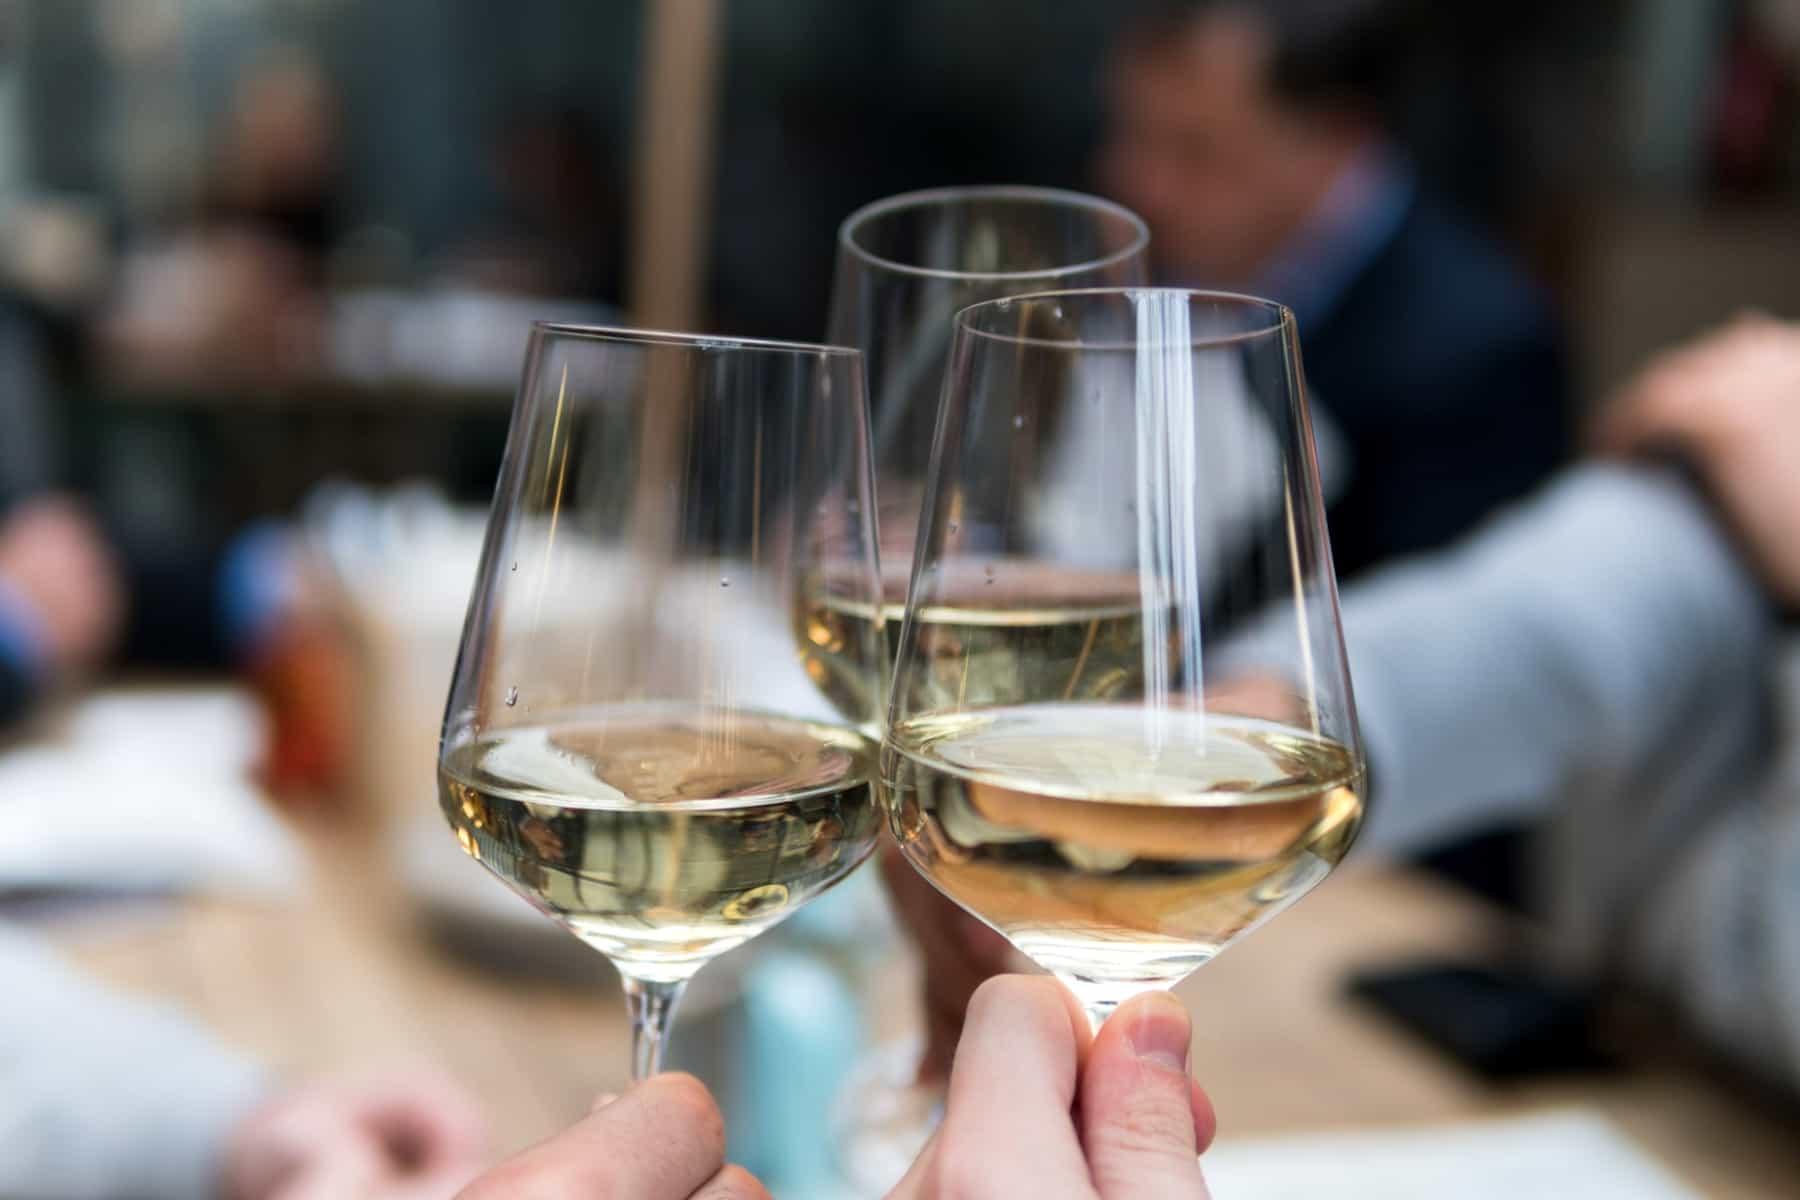 Three glasses of the driest white wine.